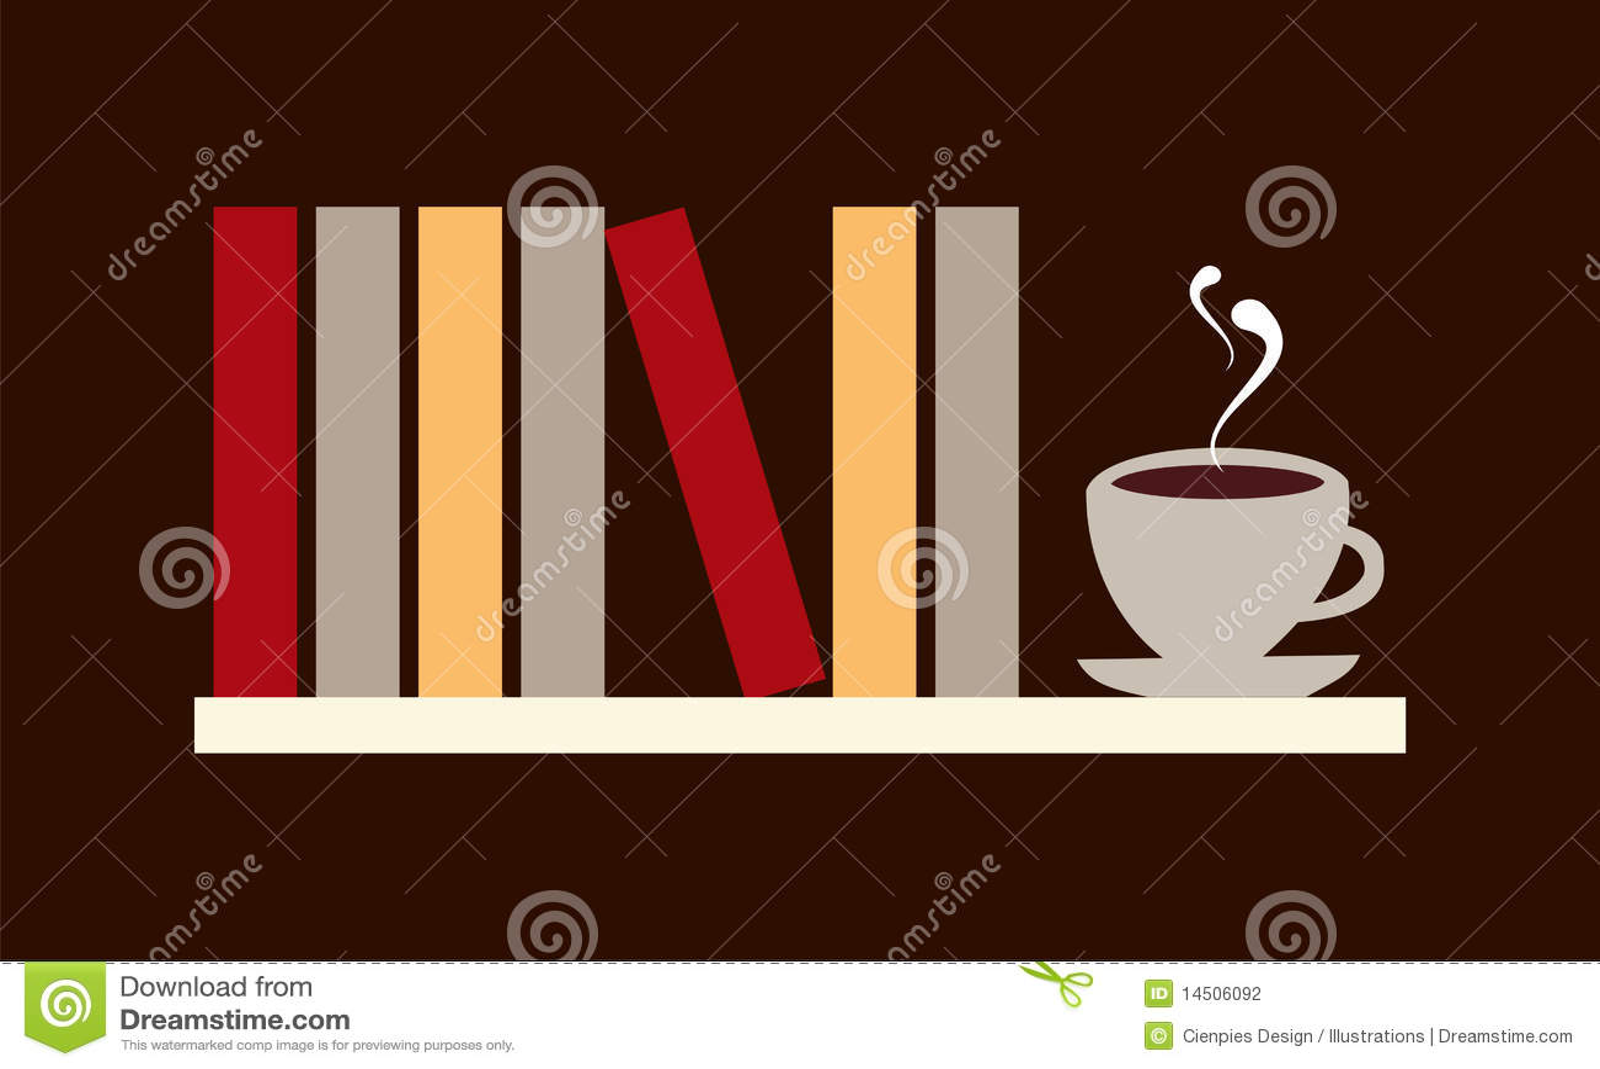 Libros e ilustración del café